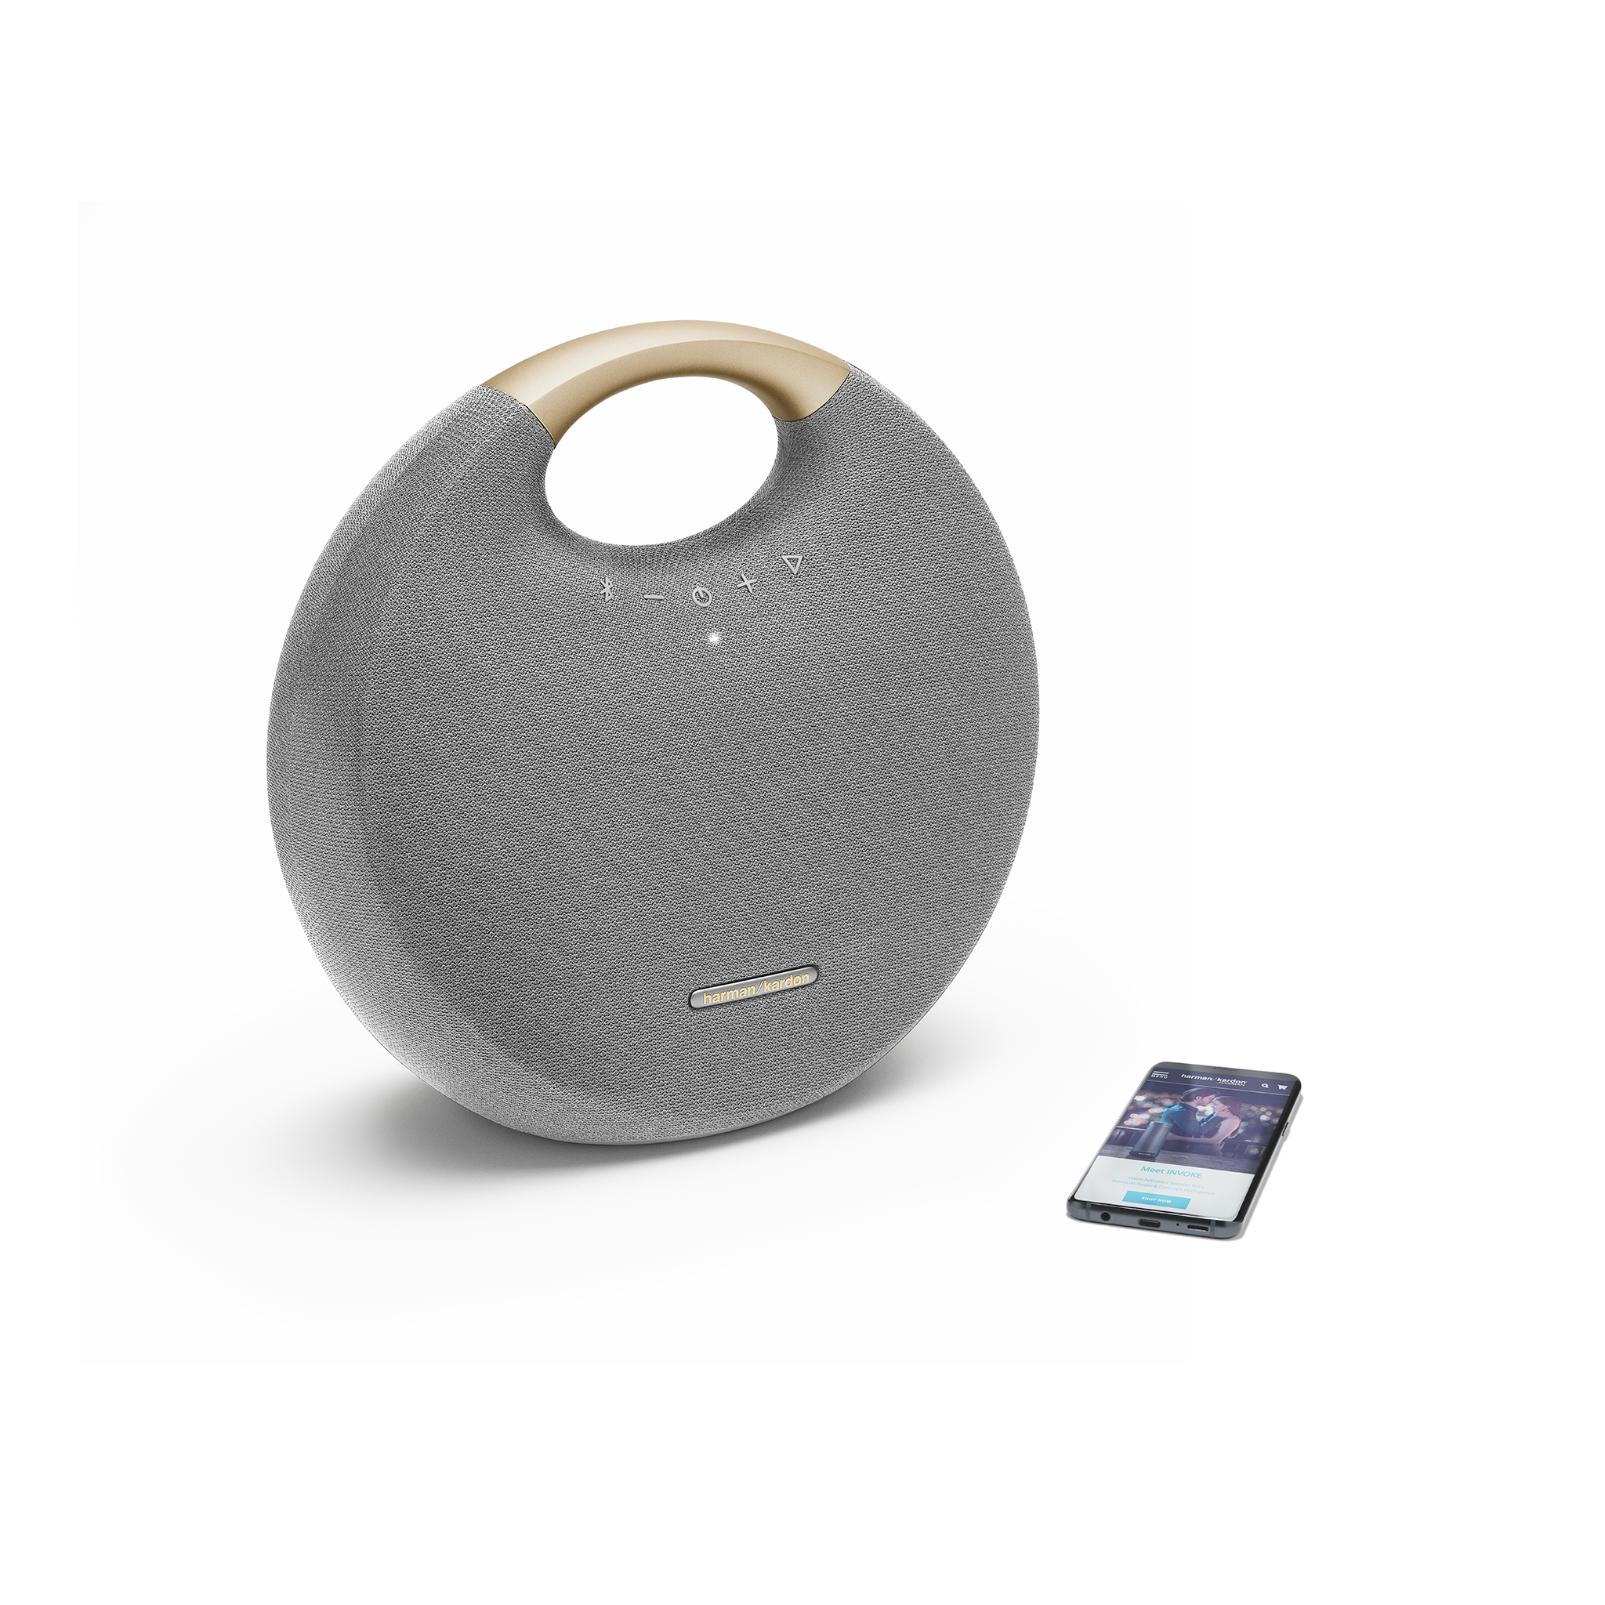 Onyx Studio 6 - Grey - Portable Bluetooth speaker - Detailshot 2